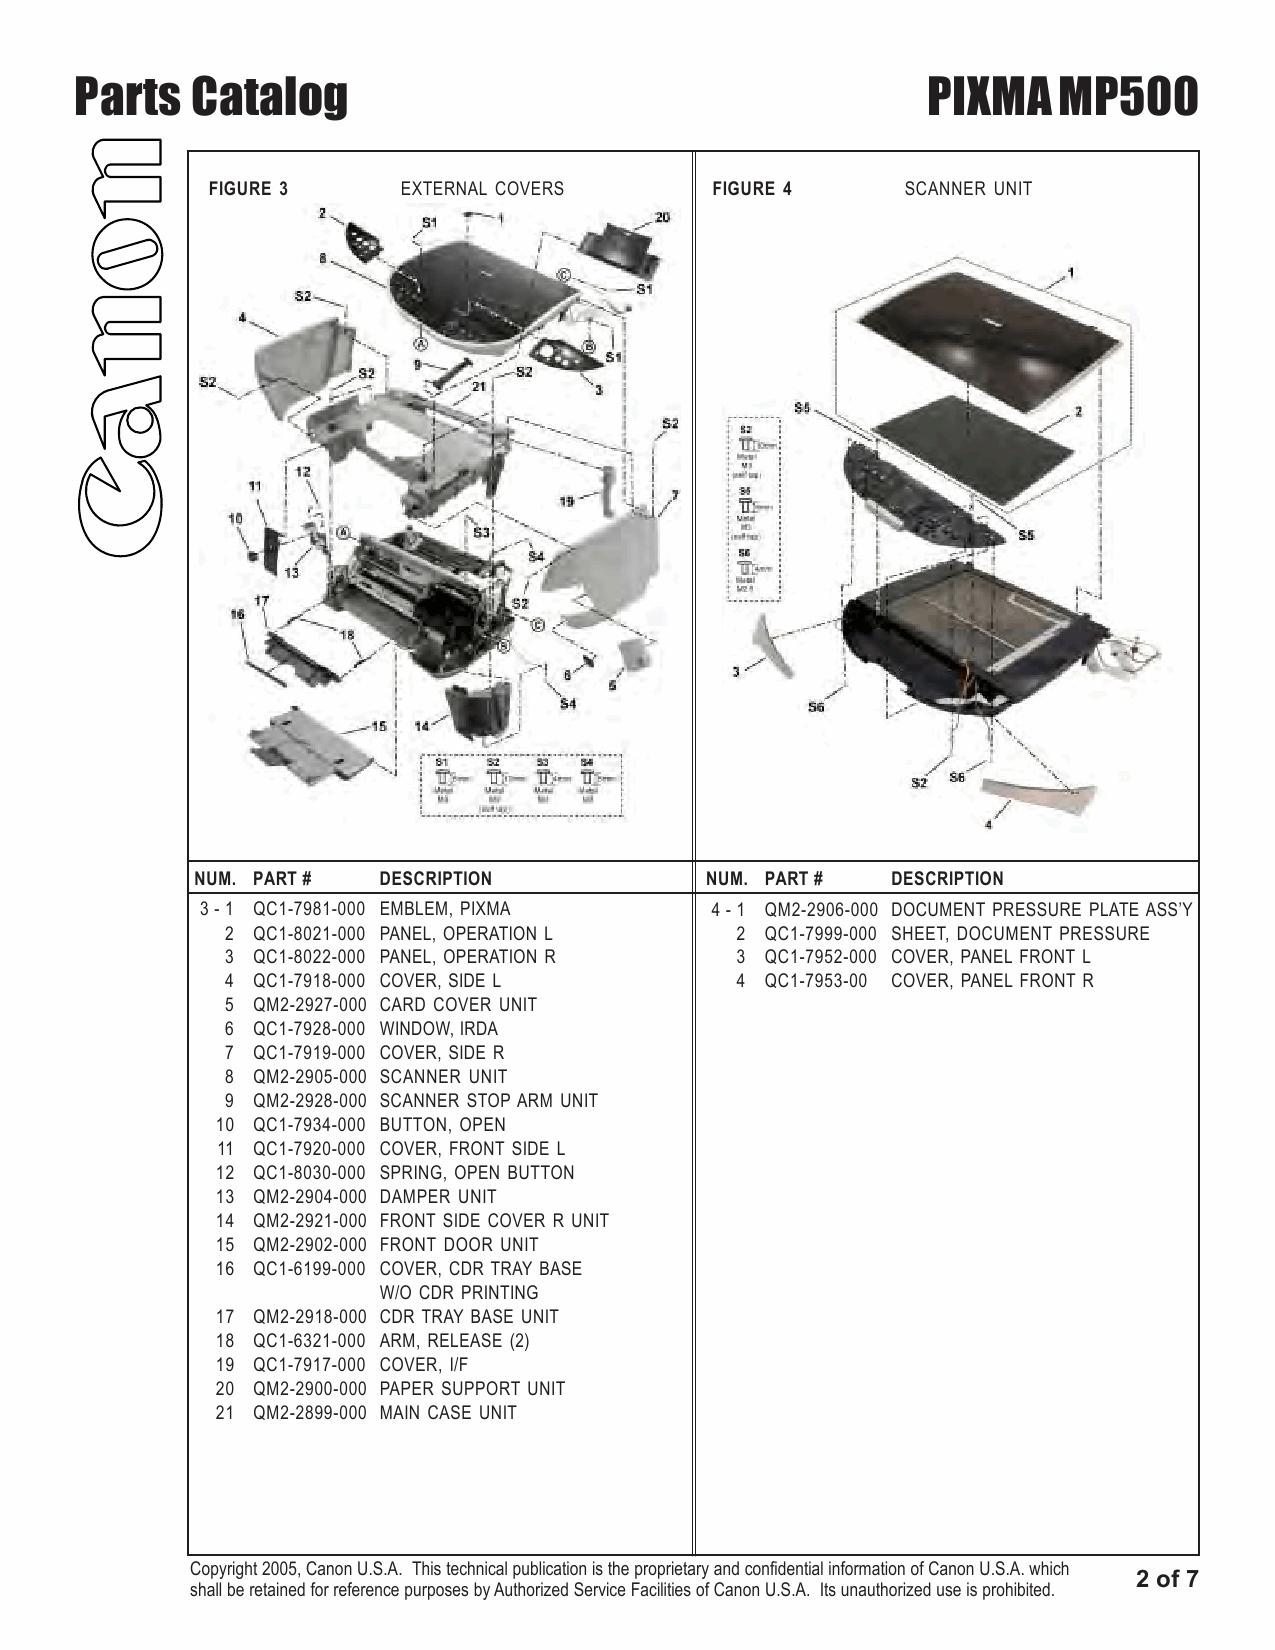 Canon PIXMA MP500 Parts Catalog Manual-3